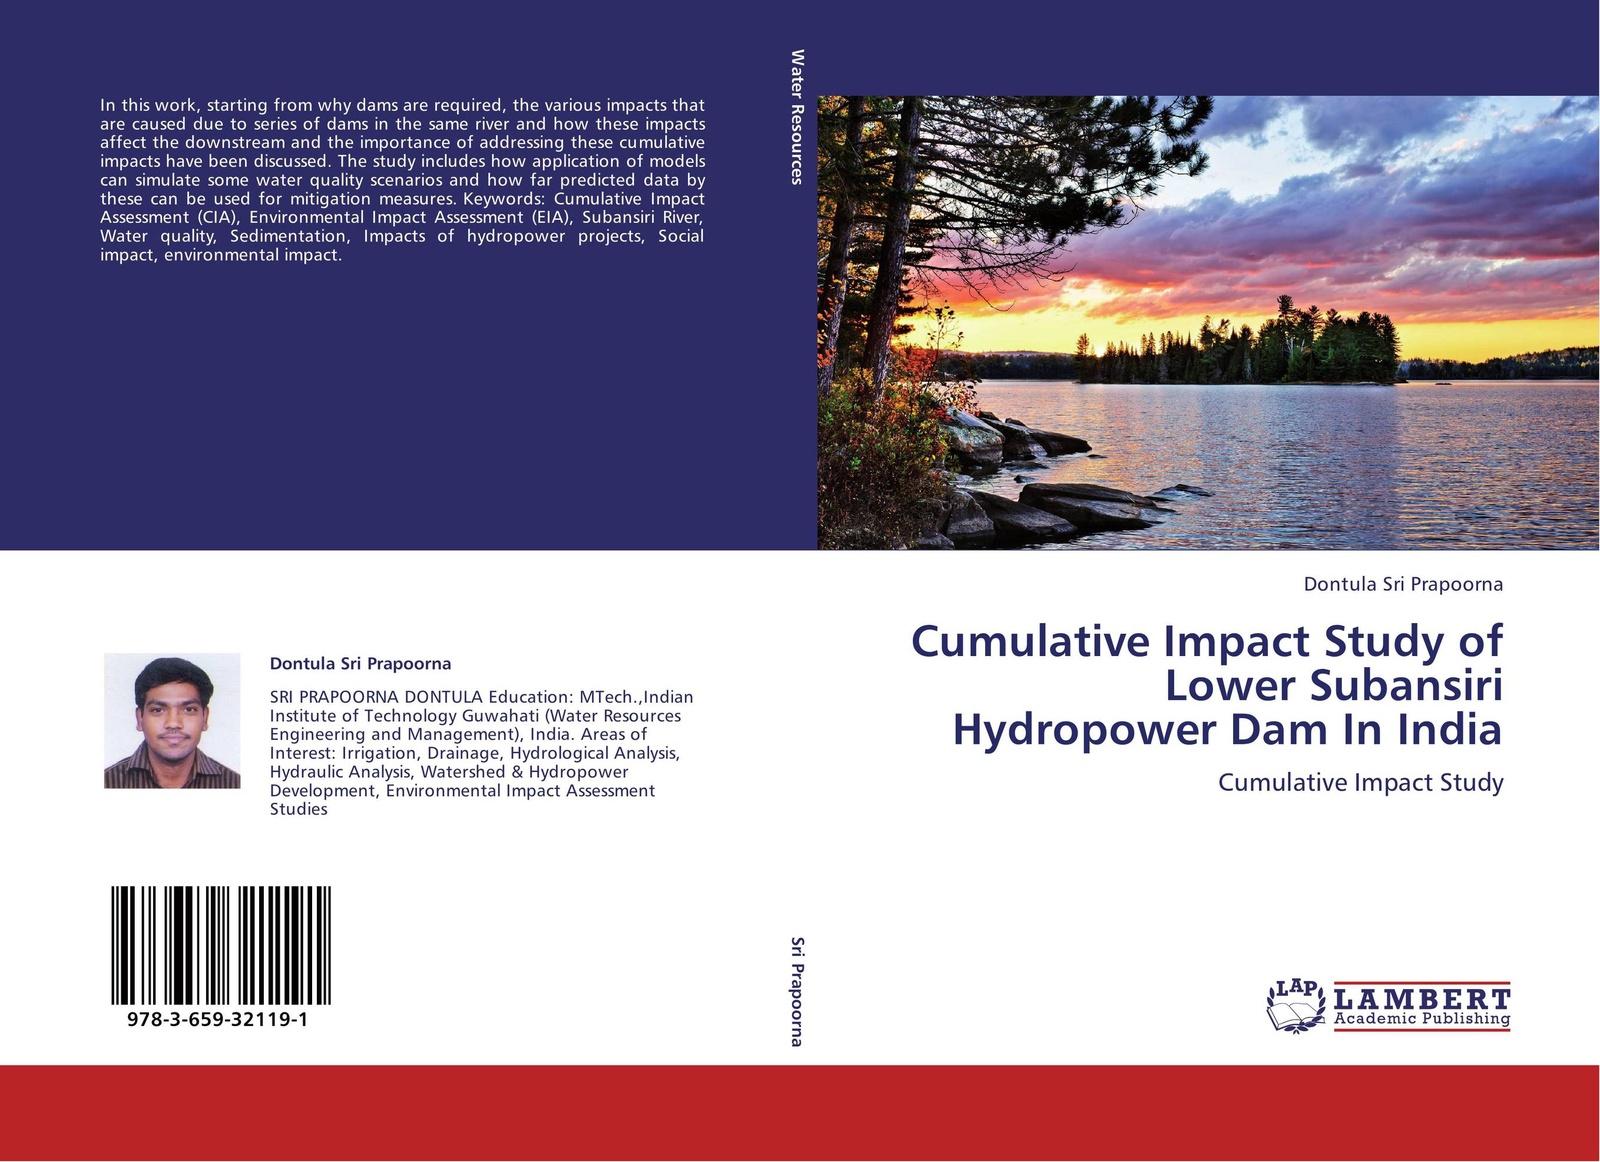 Dontula Sri Prapoorna Cumulative Impact Study of Lower Subansiri Hydropower Dam In India